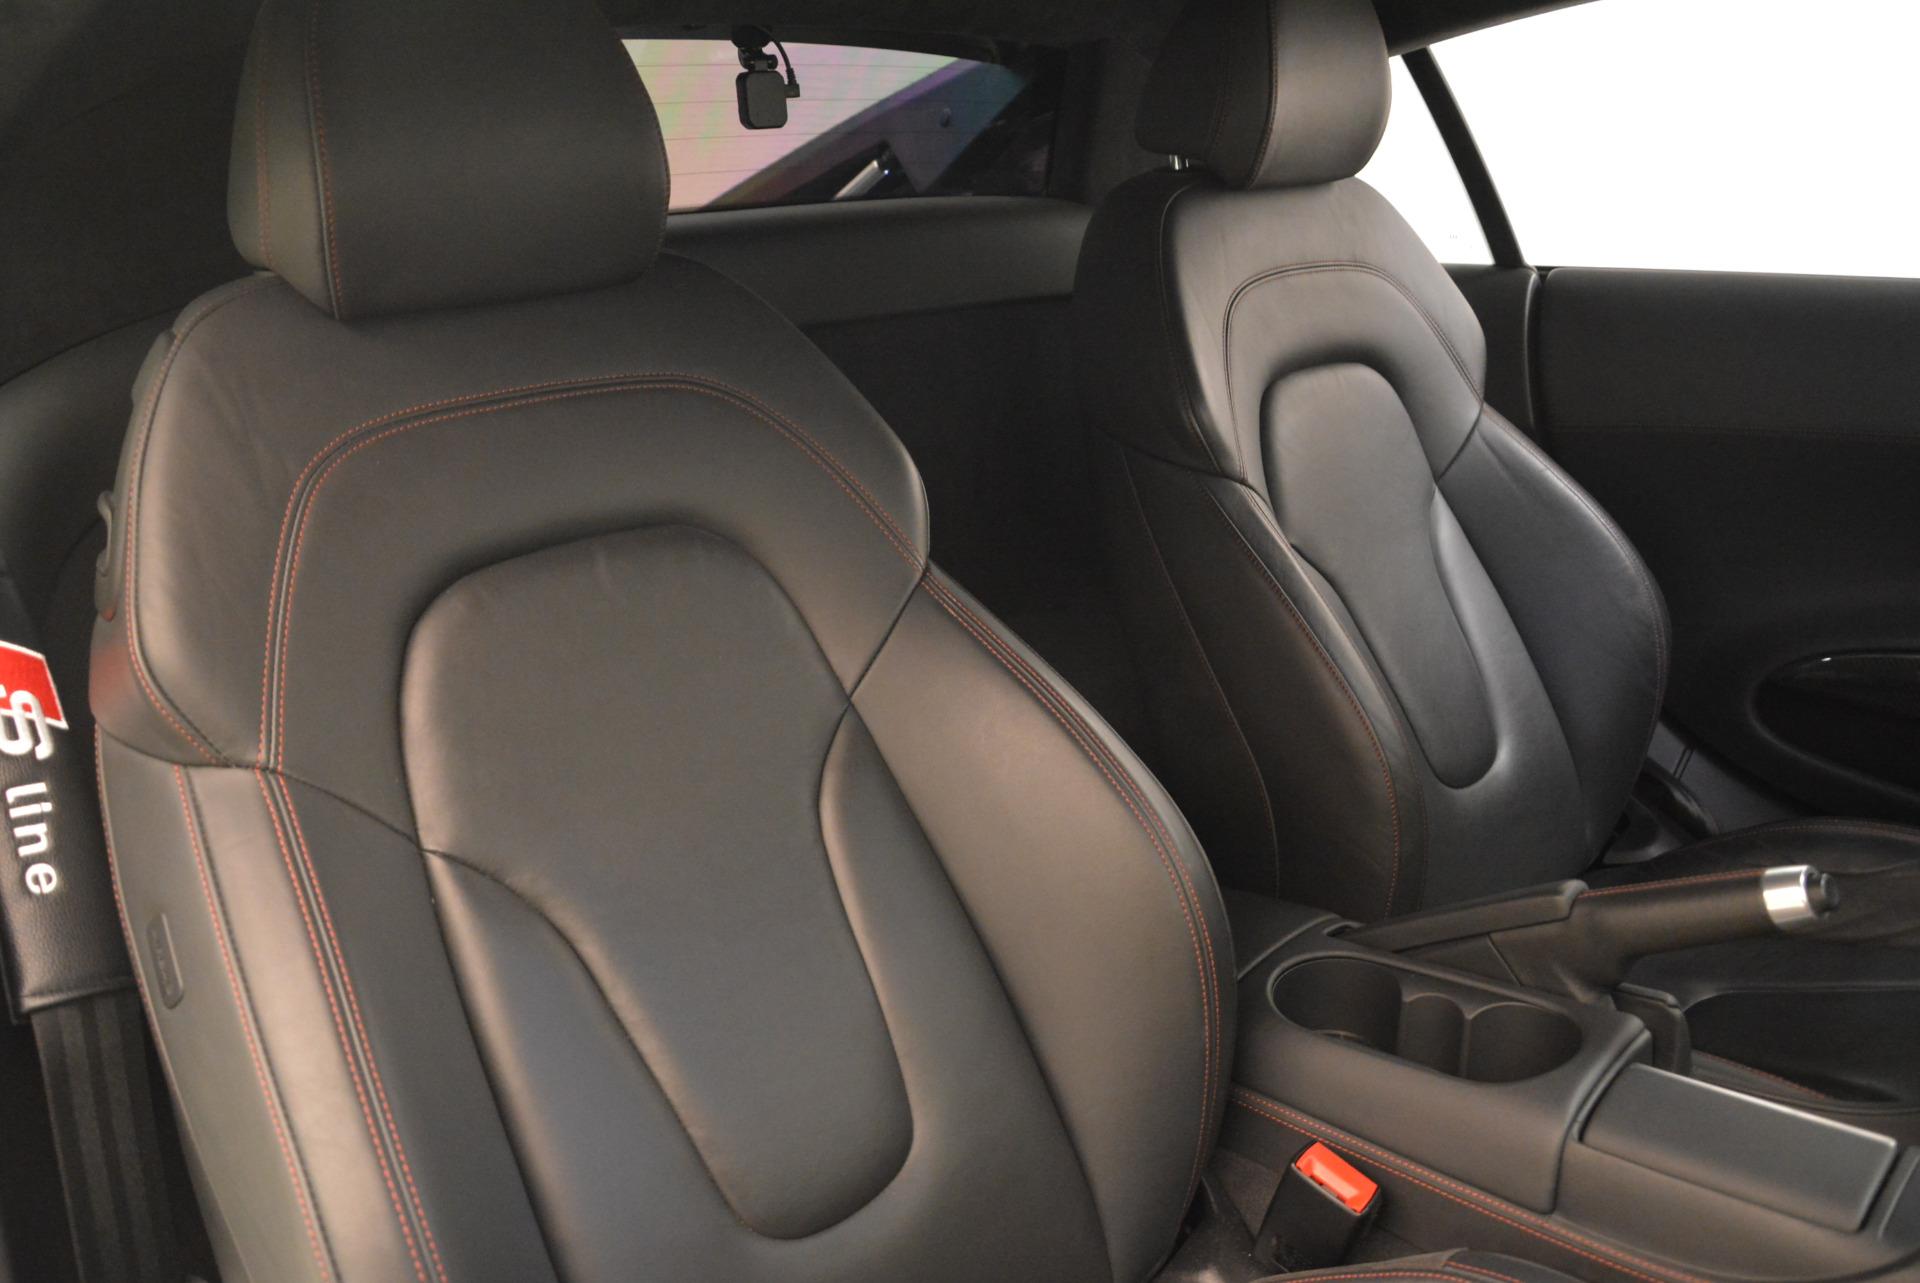 Used 2014 Audi R8 5.2 quattro For Sale In Greenwich, CT 2147_p19